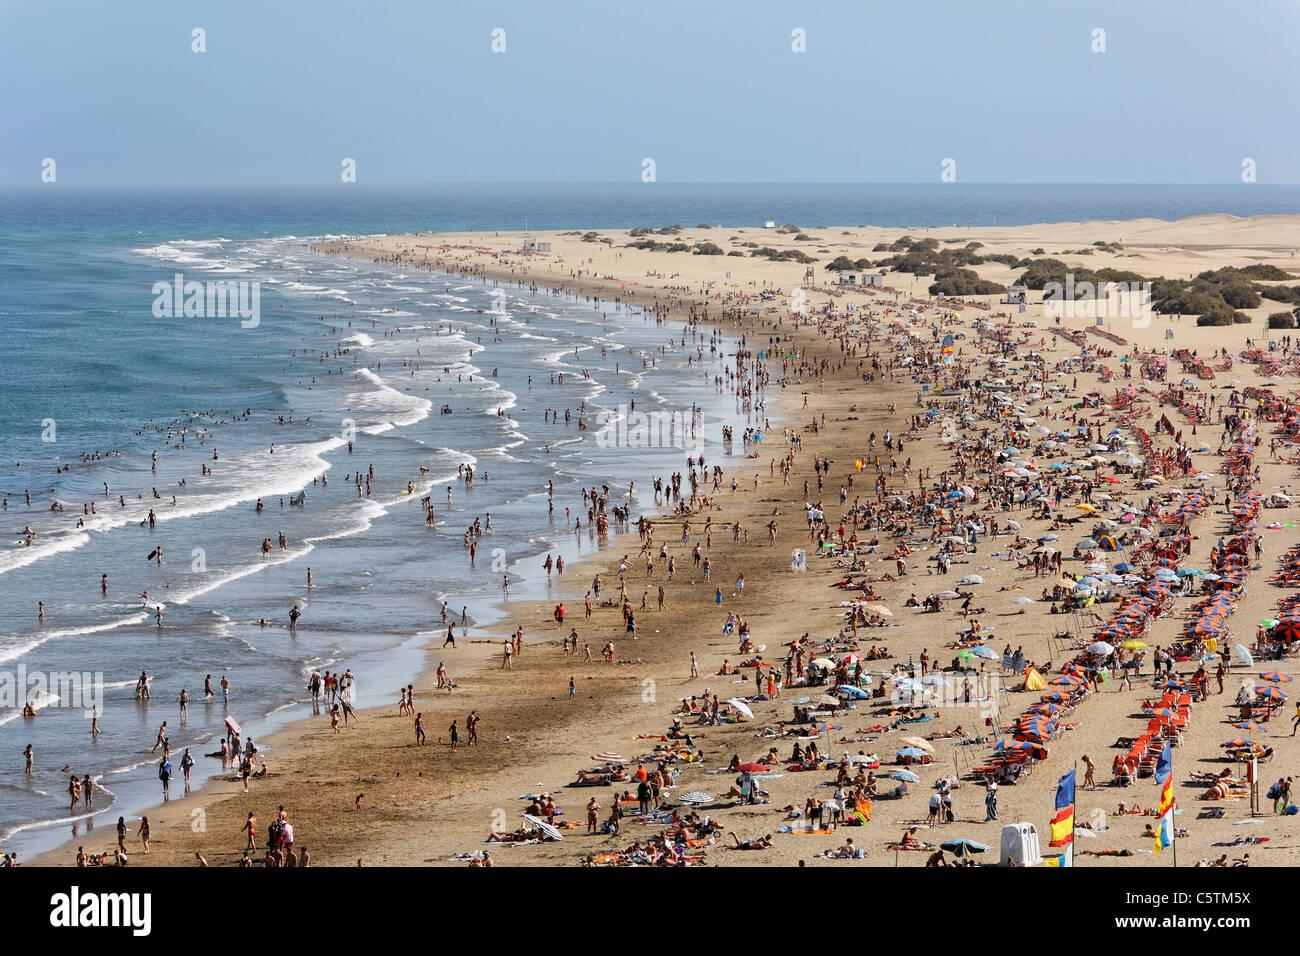 Spanien, Gran Canaria, Costa Canaria, Playa del Ingles, Touristen am Strand Stockbild